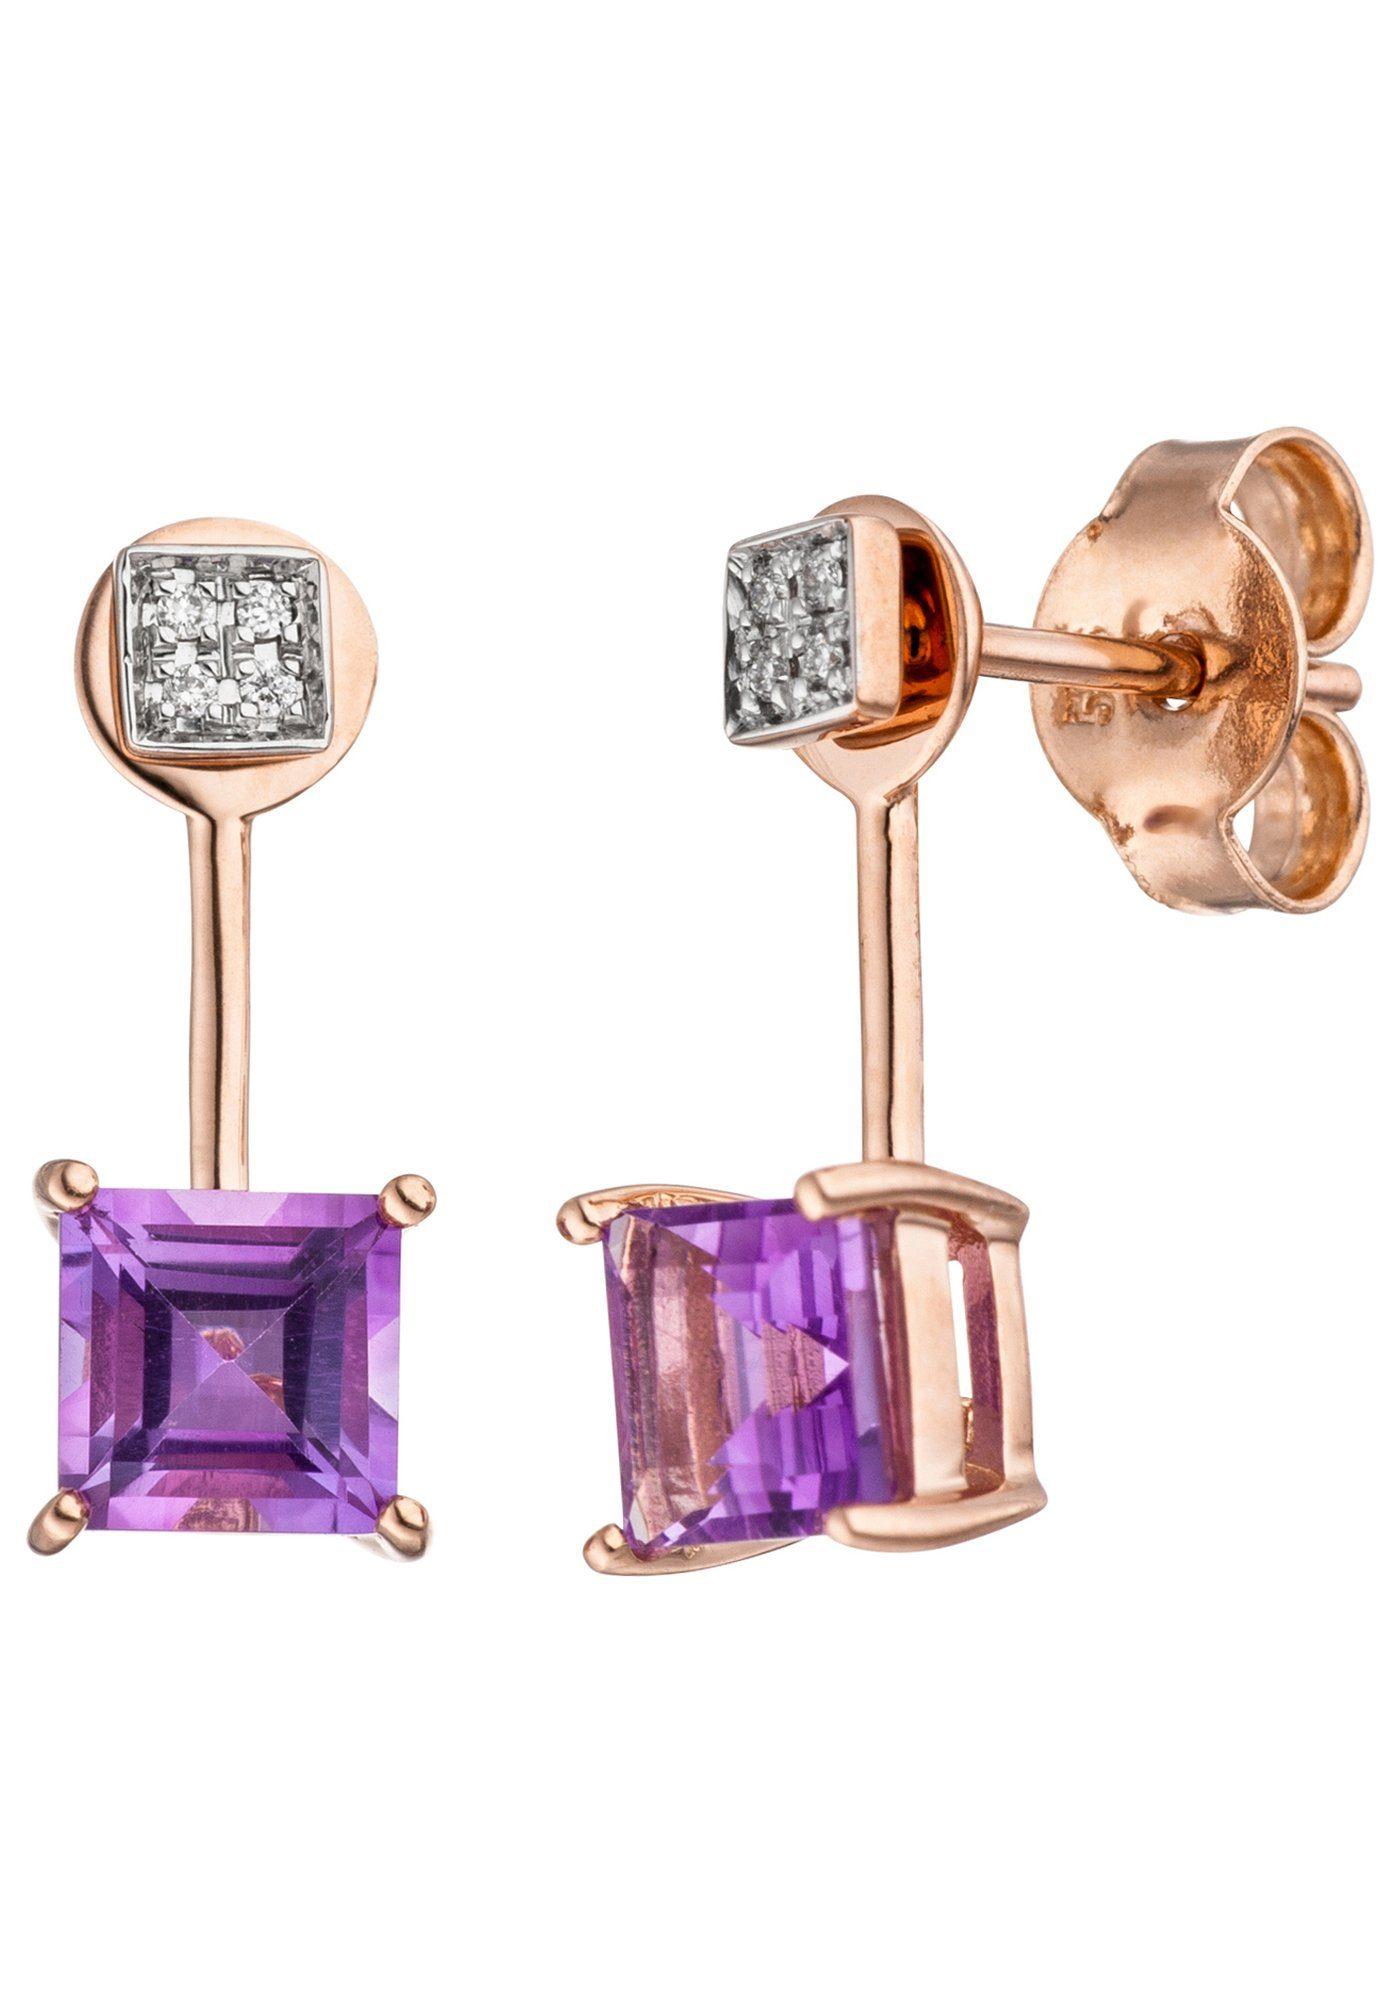 JOBO Paar Ohrhänger 585 Roségold bicolor mit 8 Diamanten und Amethyst